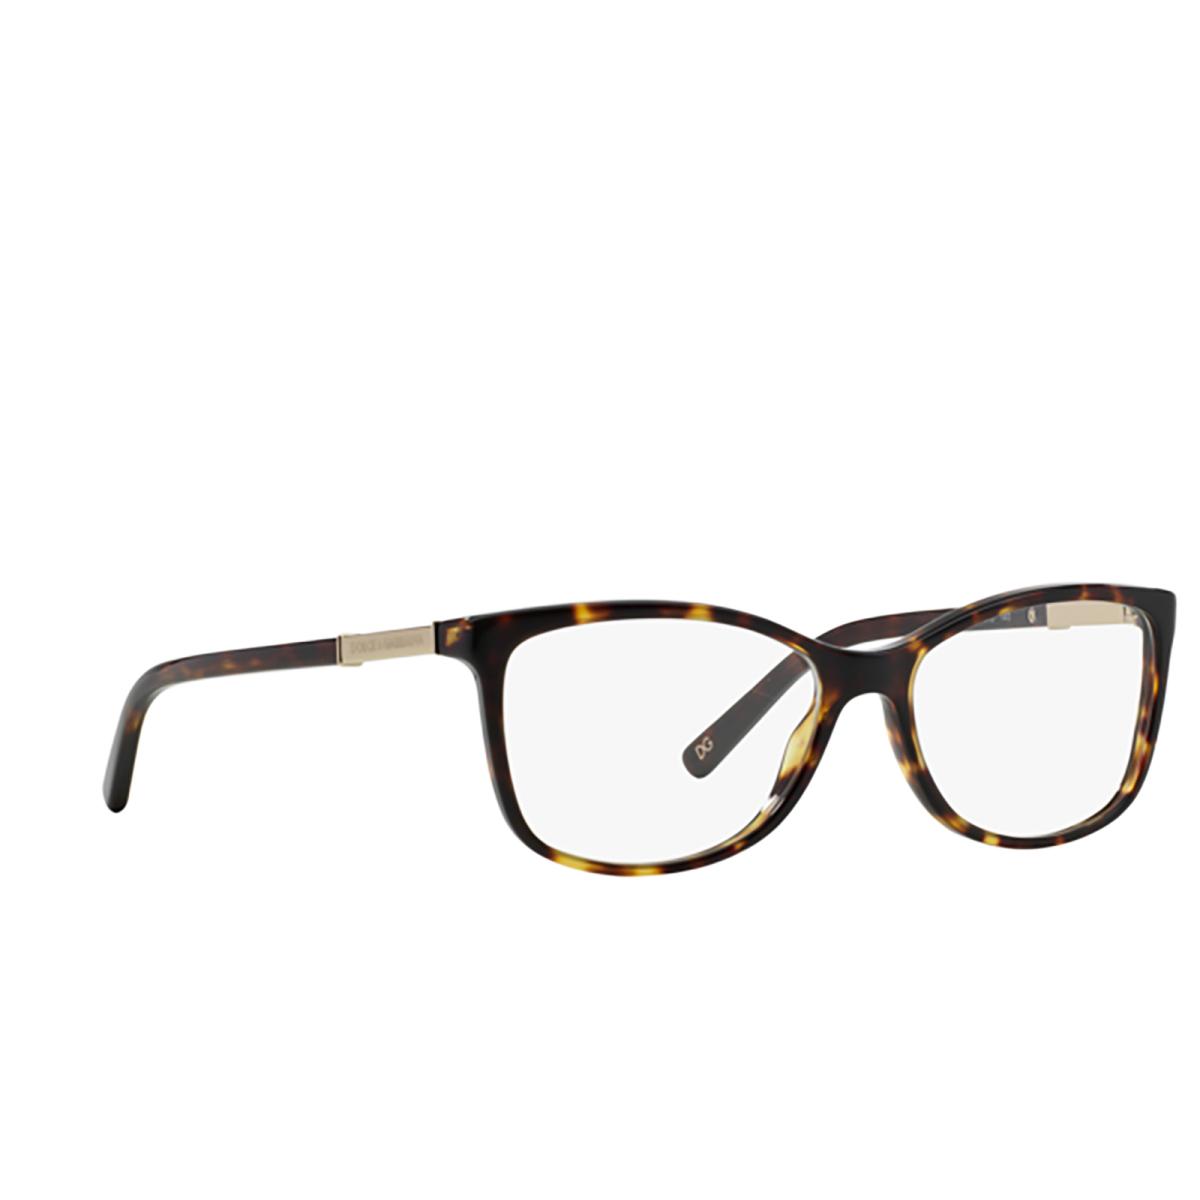 Dolce & Gabbana® Square Eyeglasses: DG3107 color 502 - three-quarters view.